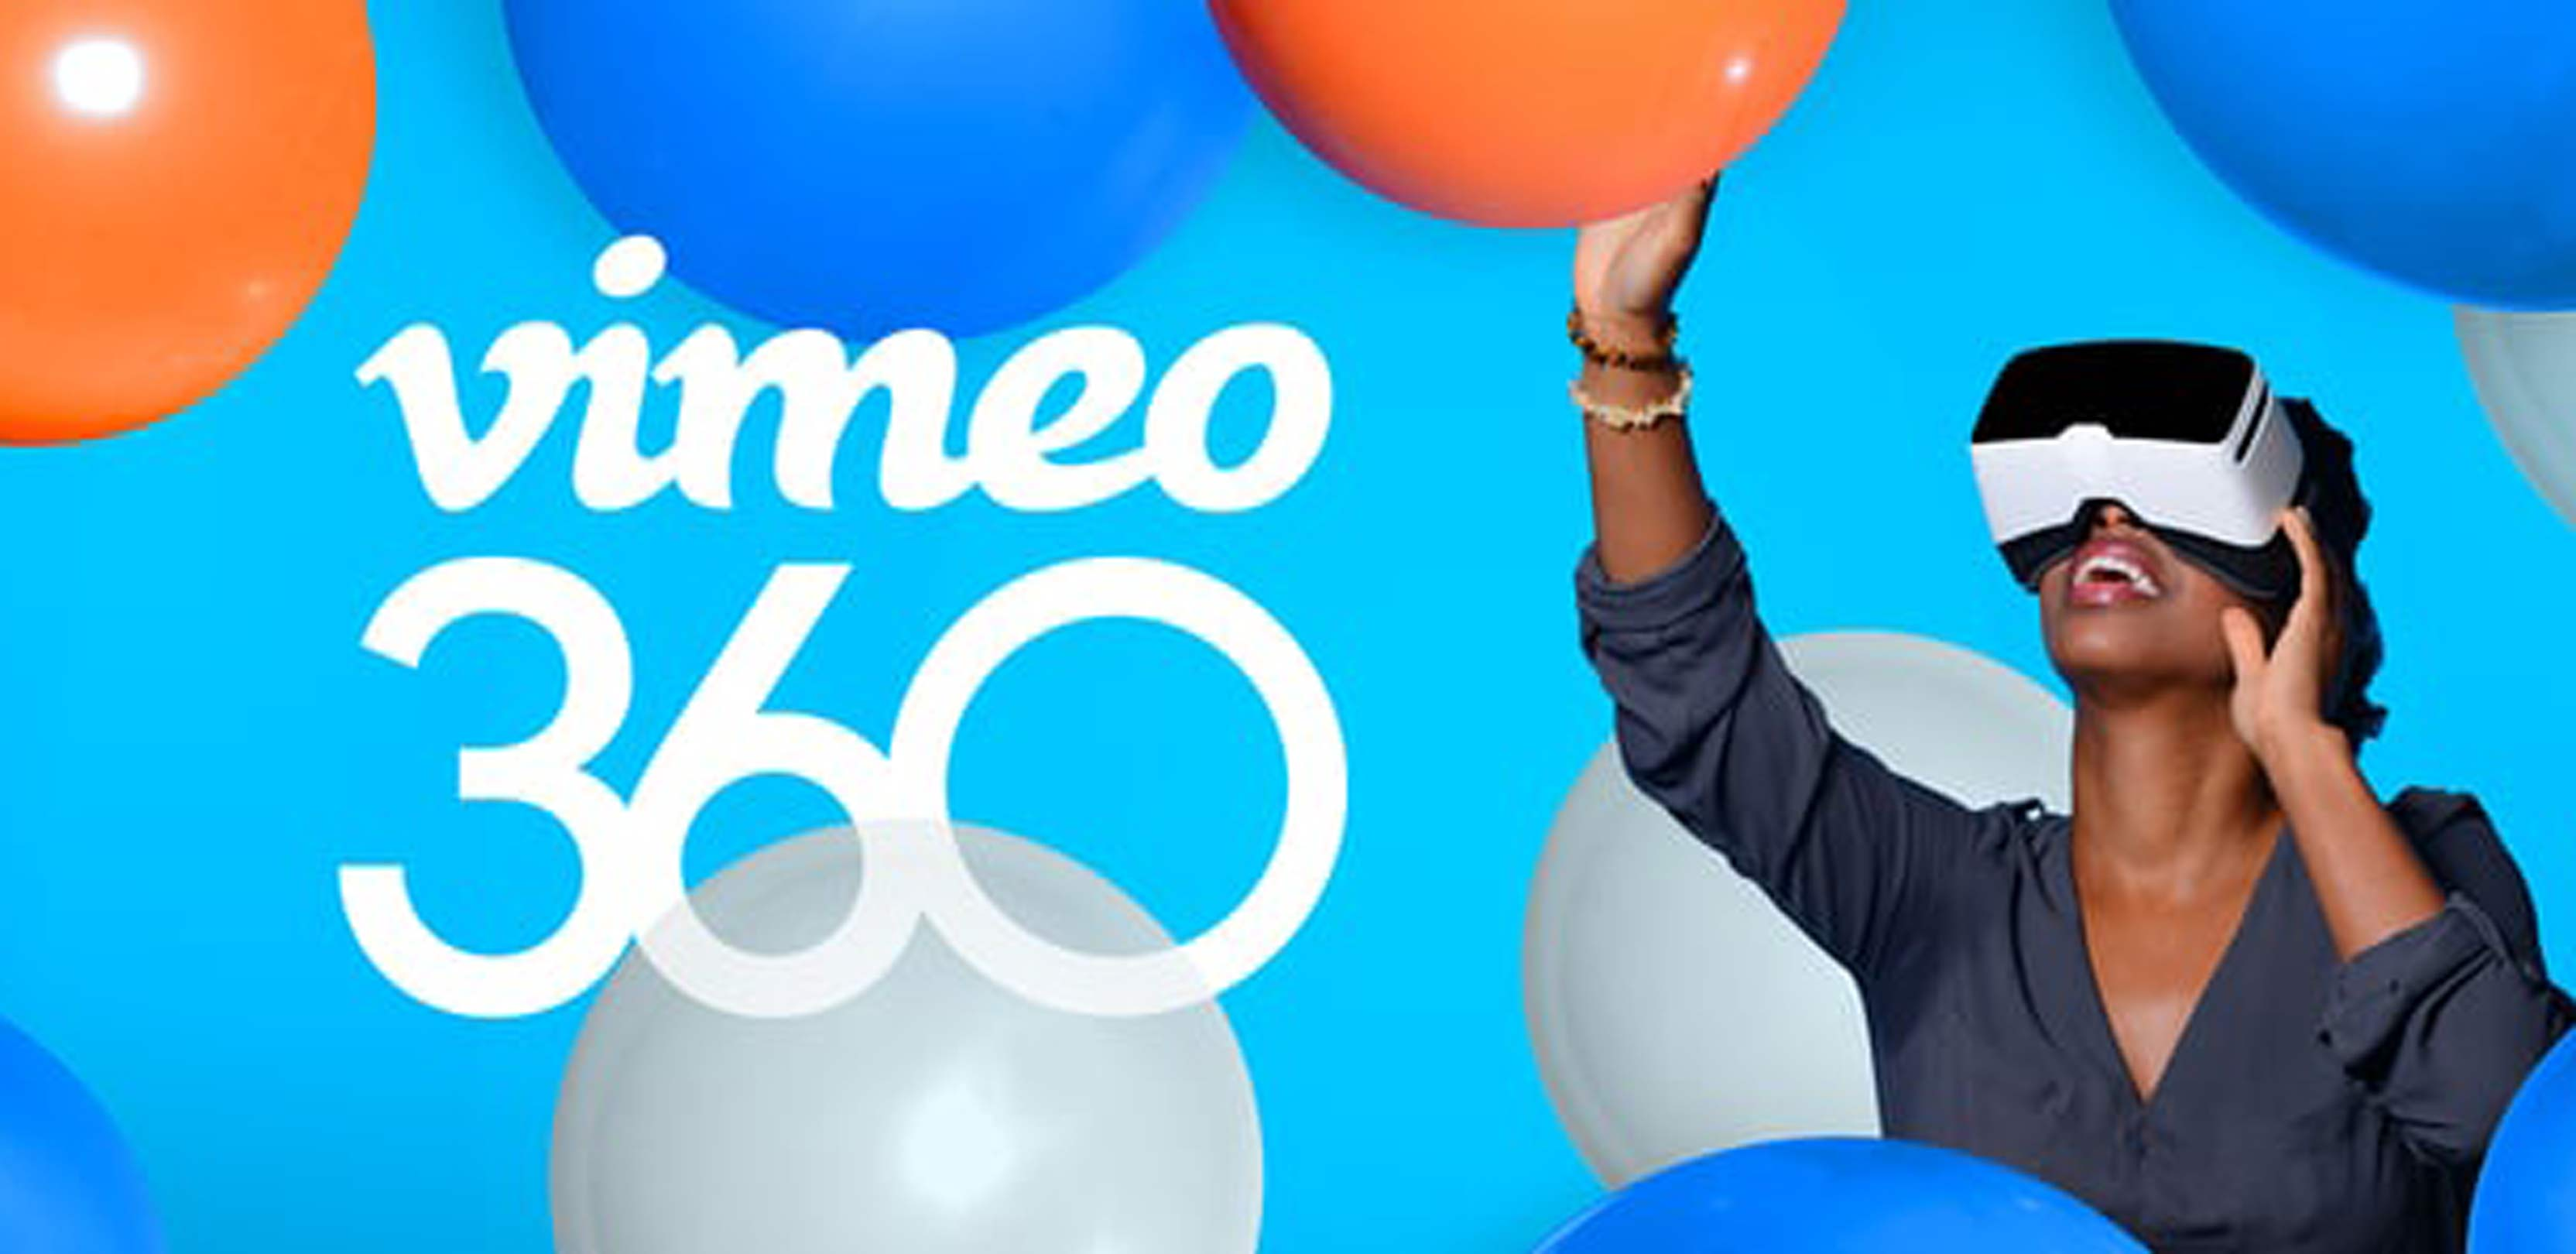 Vimeo 320 Video